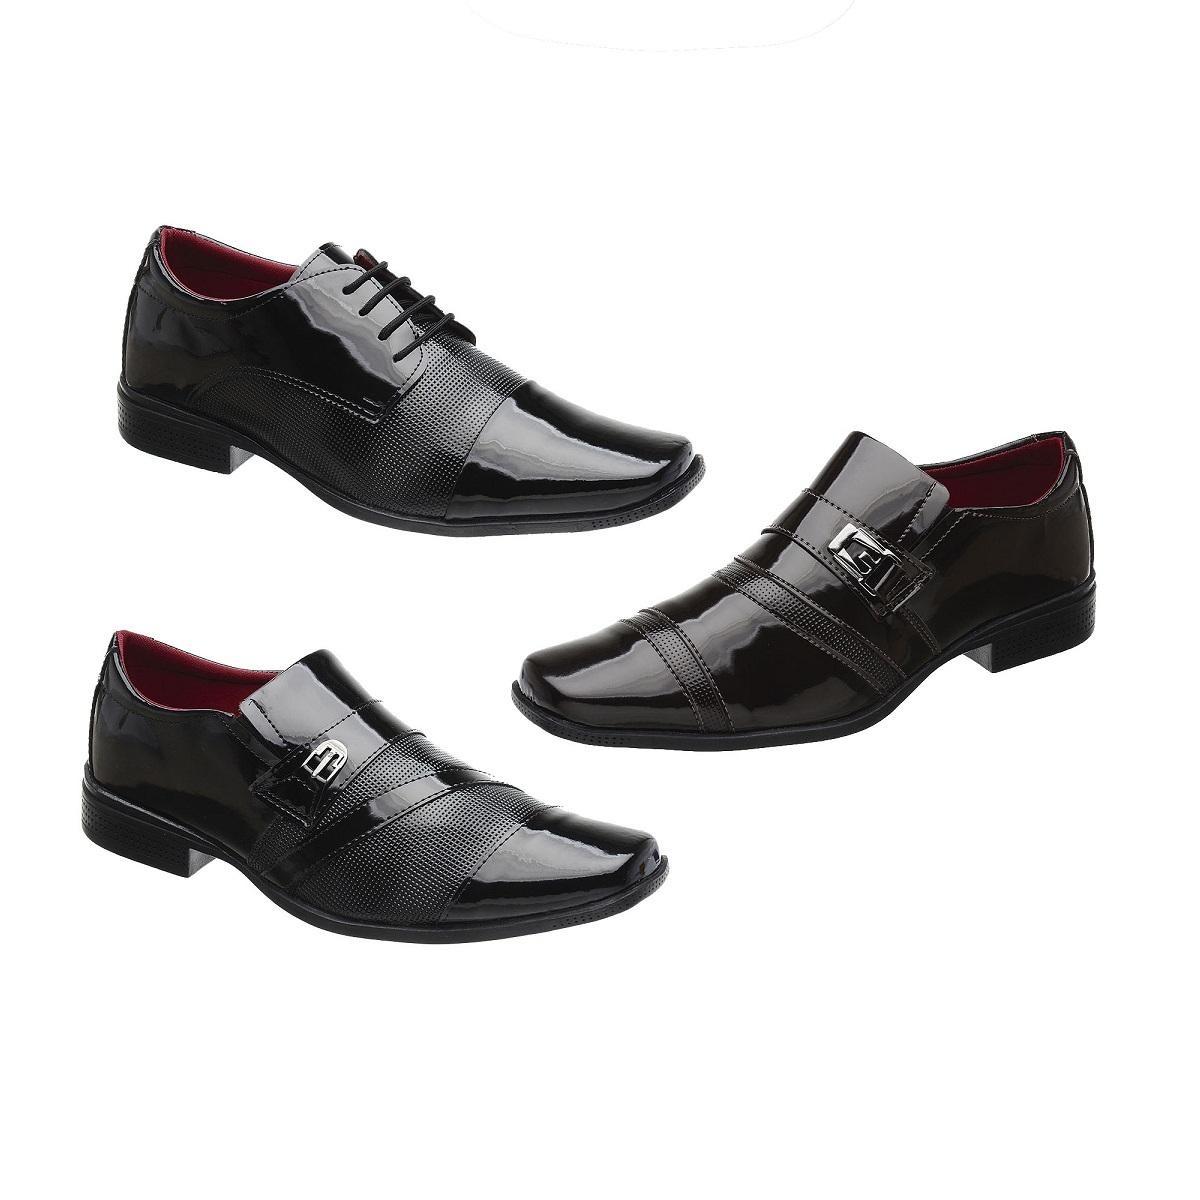 f8f67e477 kit 3 pares sapato social masculino verniz khaata. Carregando zoom.